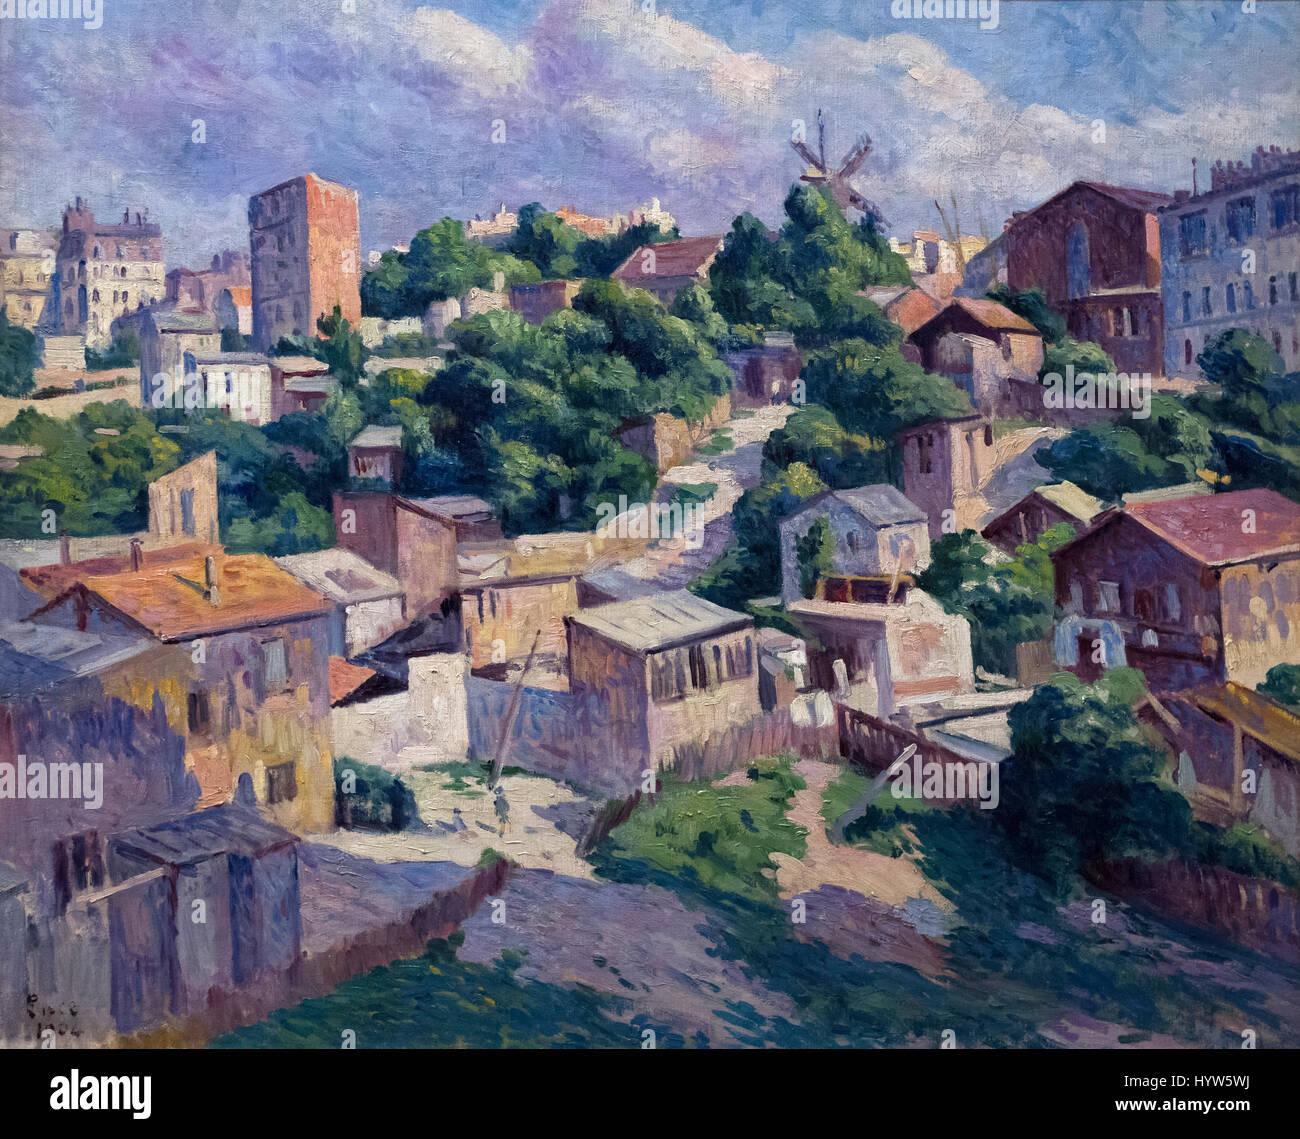 Maximilien Luce (1858-1941) Thicket, Montmartre, 1904. Stock Photo